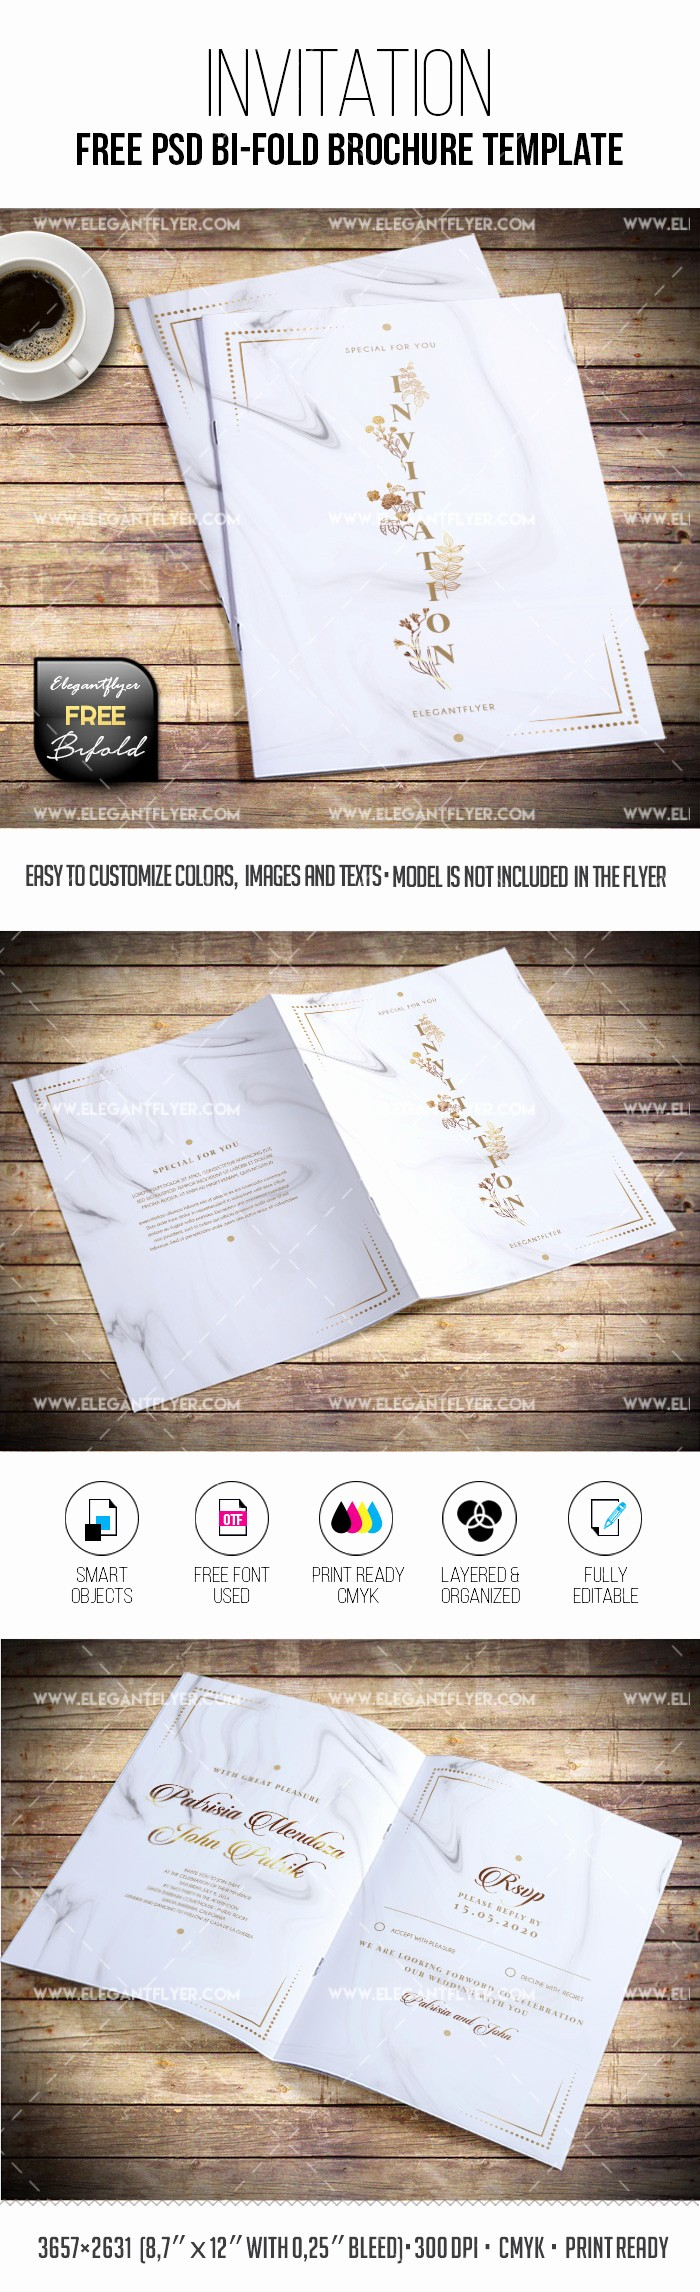 Bi-fold Card Template Lovely Invitation Card – Free Bi Fold Brochure Template – by